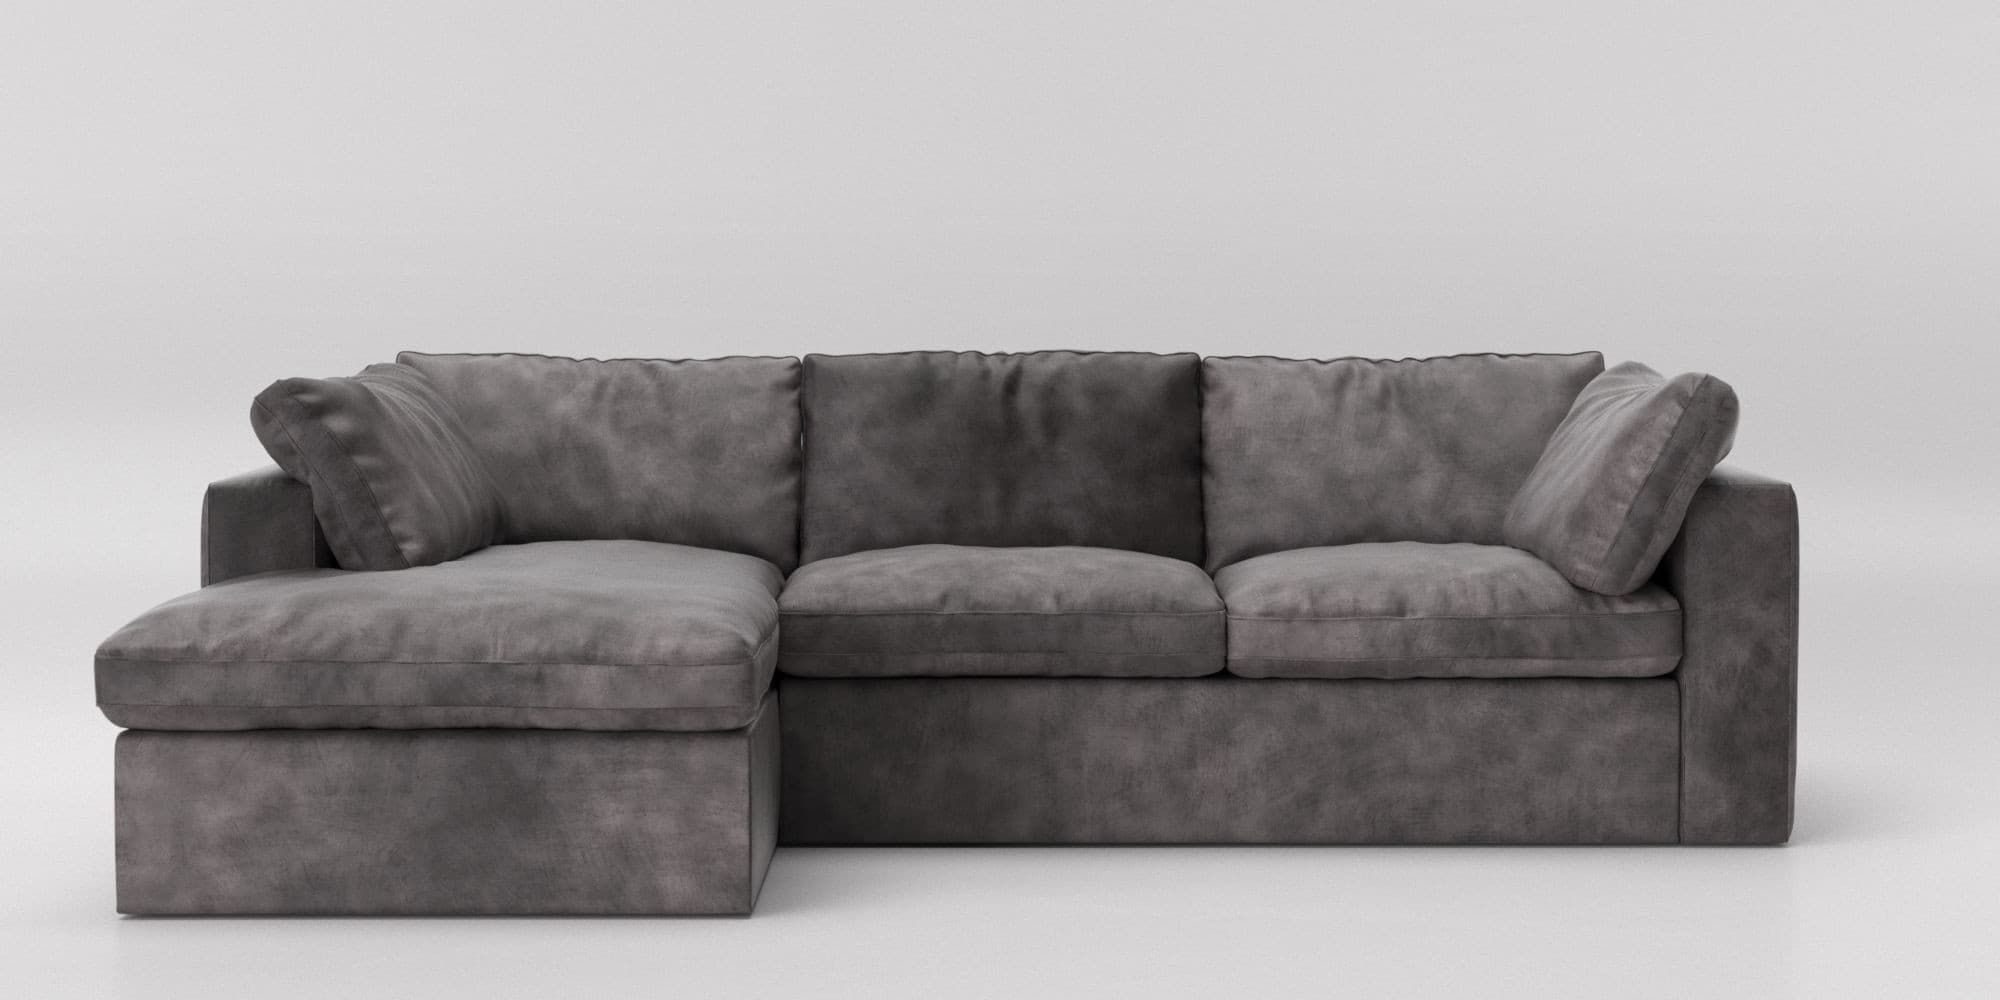 Seattle in 2019 | Мягкая мебель | Corner sofa, Sofa, Furniture